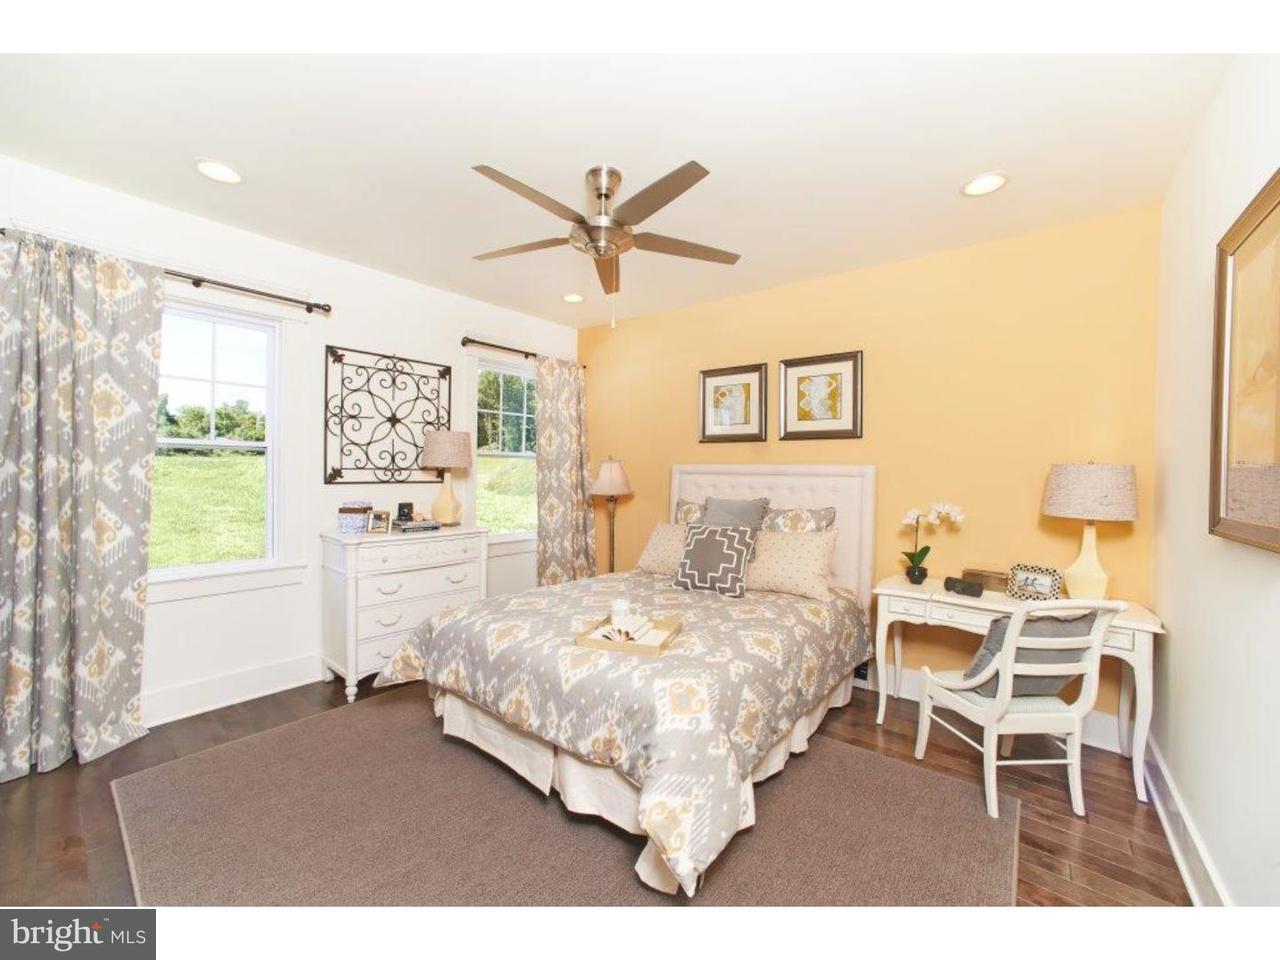 Additional photo for property listing at 133 SPRING OAK DR #00RSD  Malvern, Pennsylvania 19355 Estados Unidos